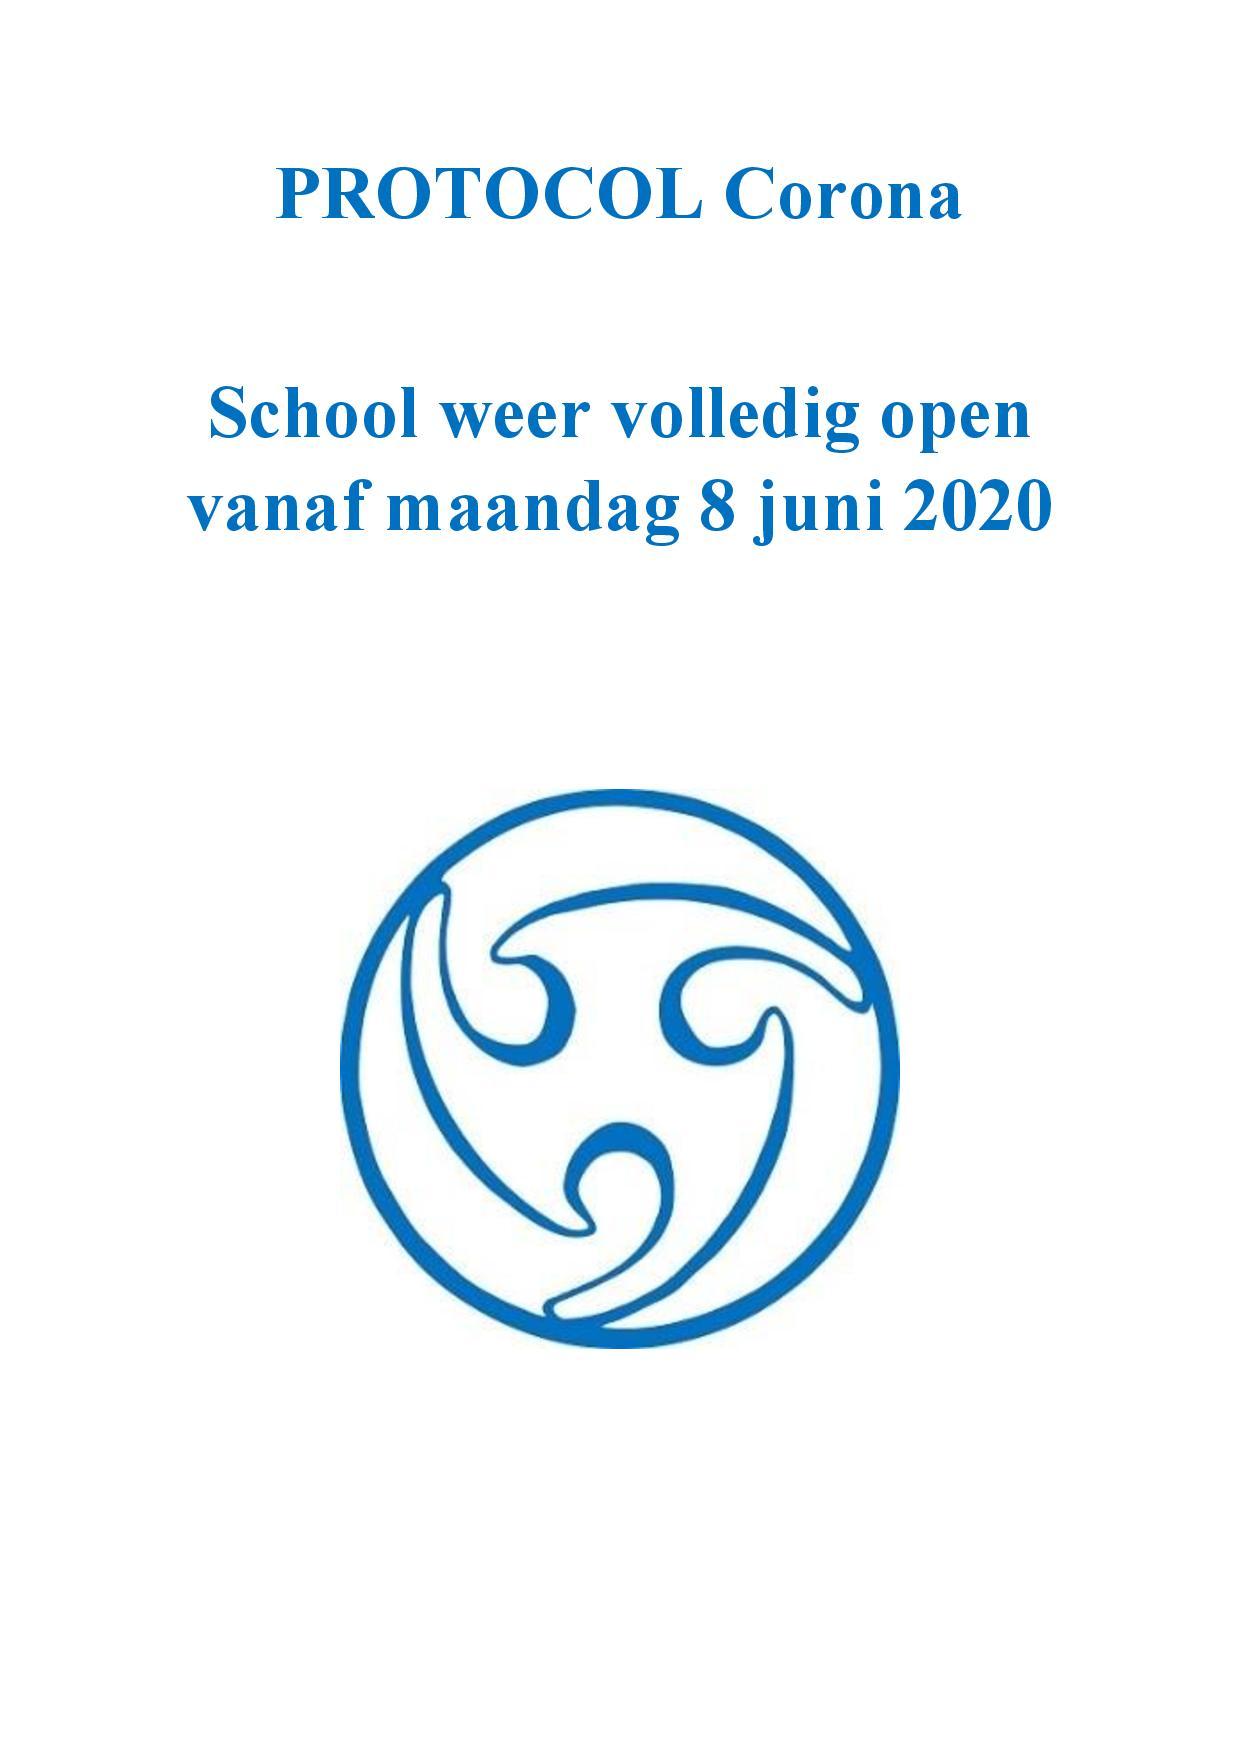 Protocol Corona – School Weer Volledig Open Vanaf Maandag 8 Juni 2020